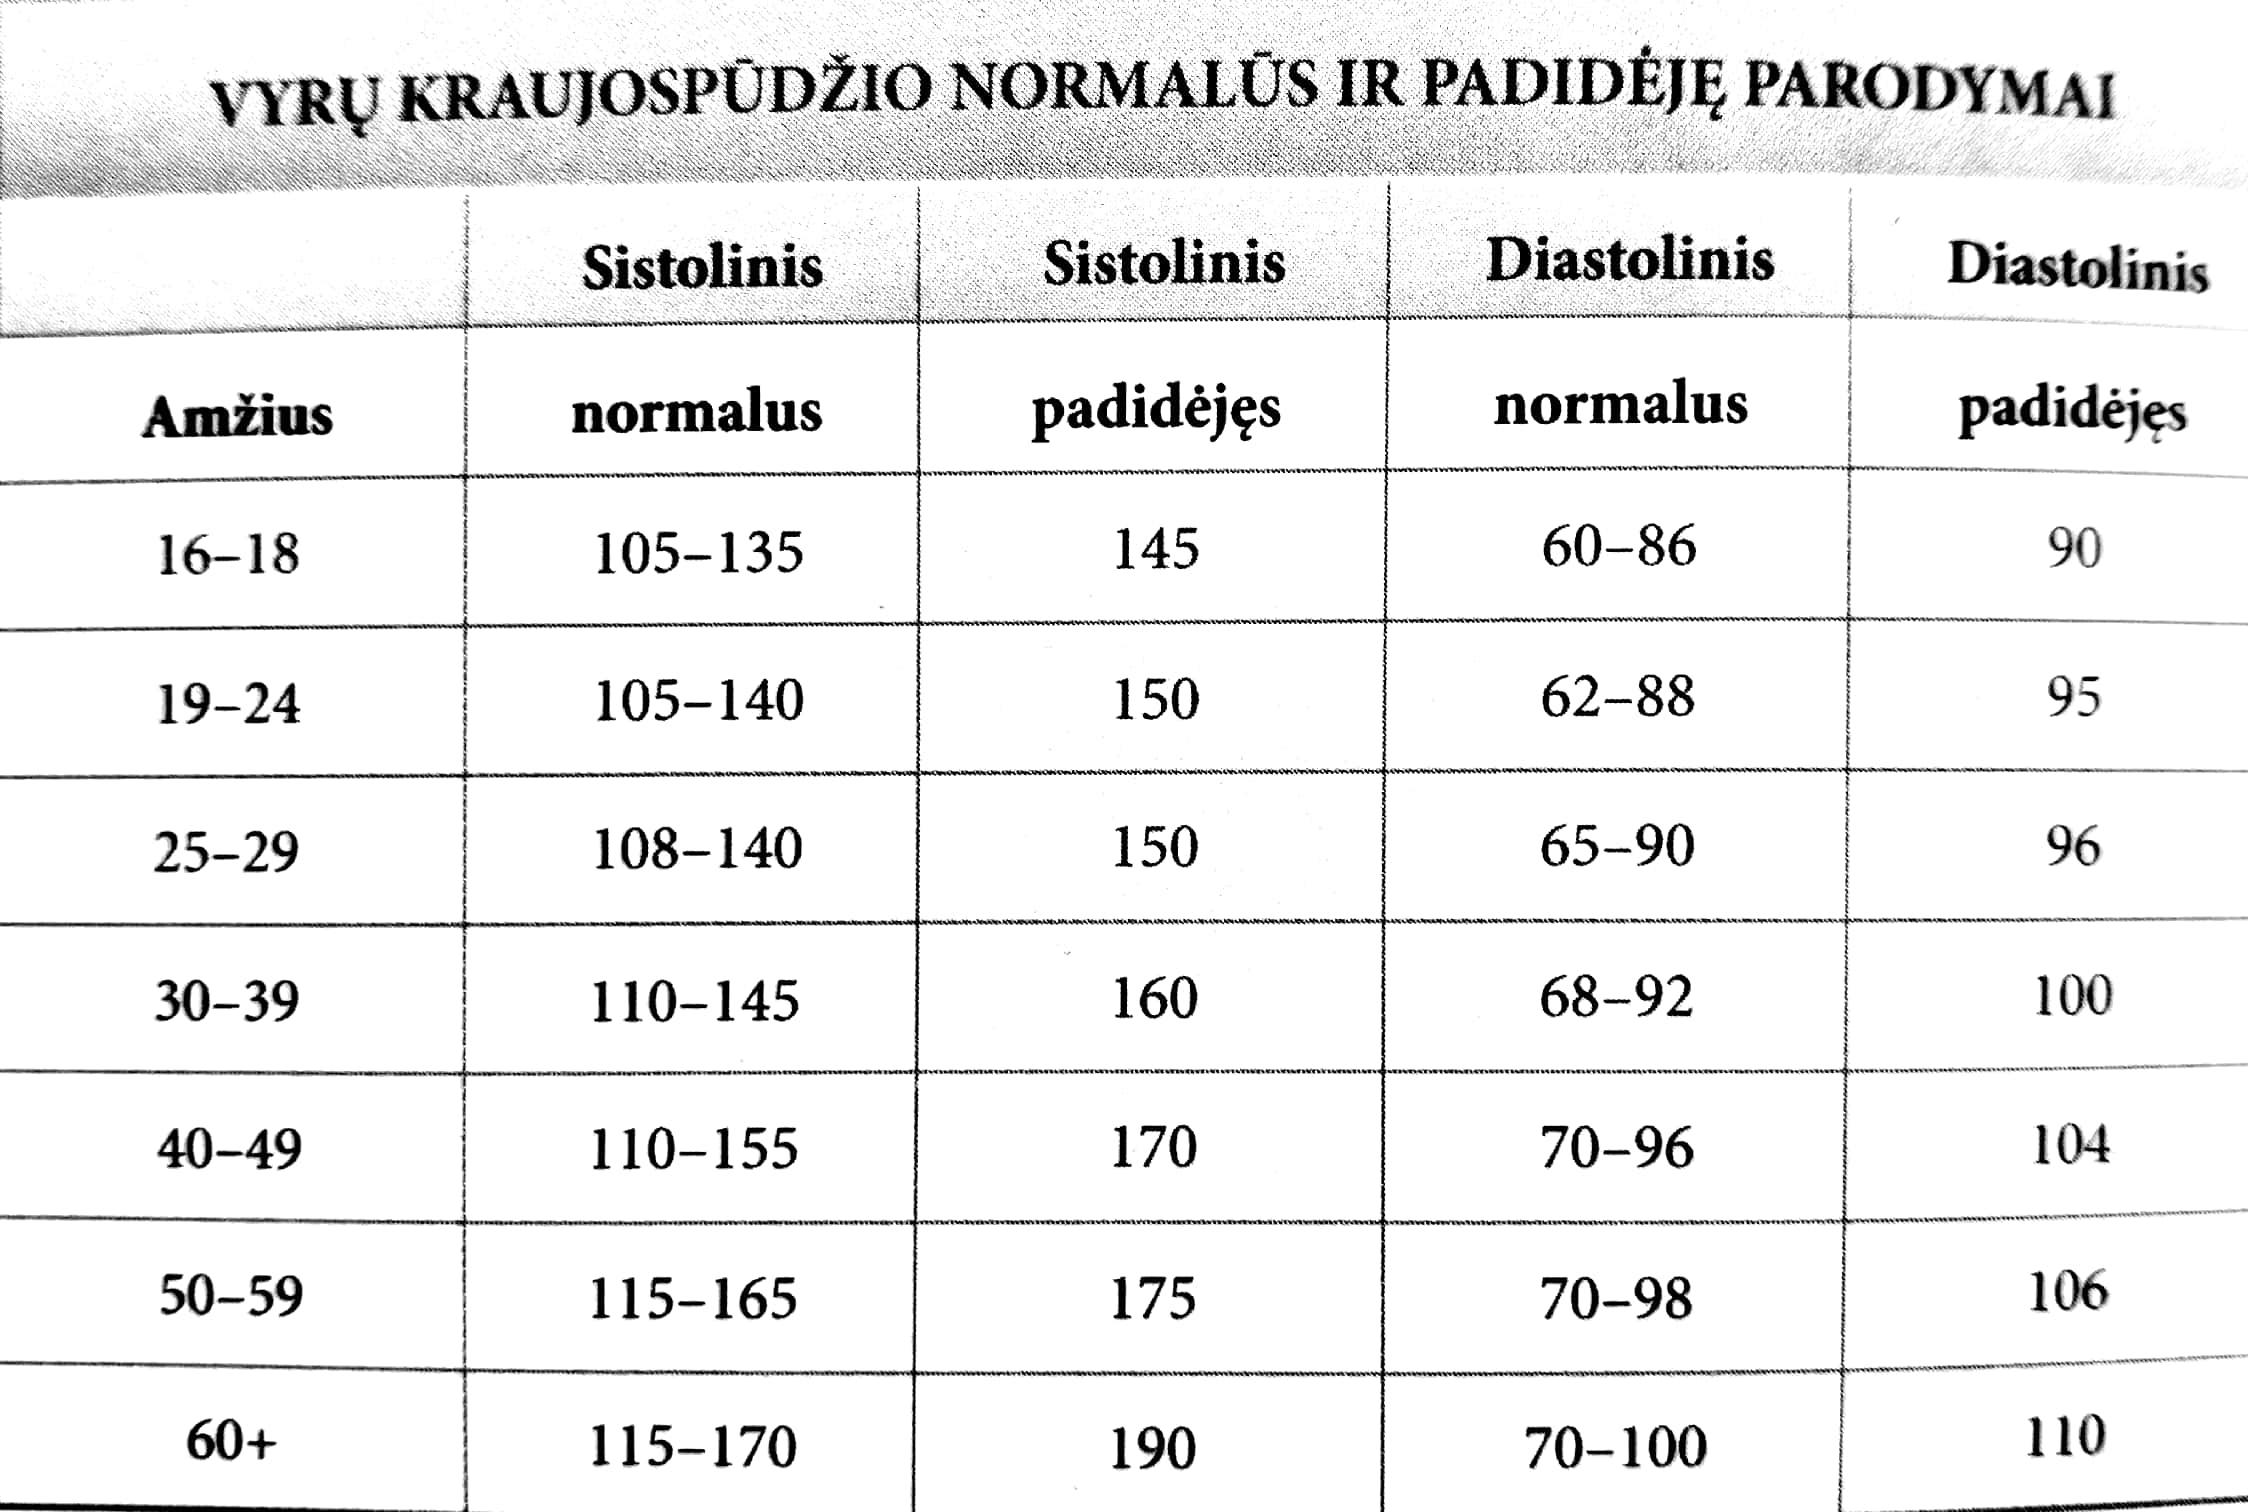 hipertenzija 3 4 etapo rizika